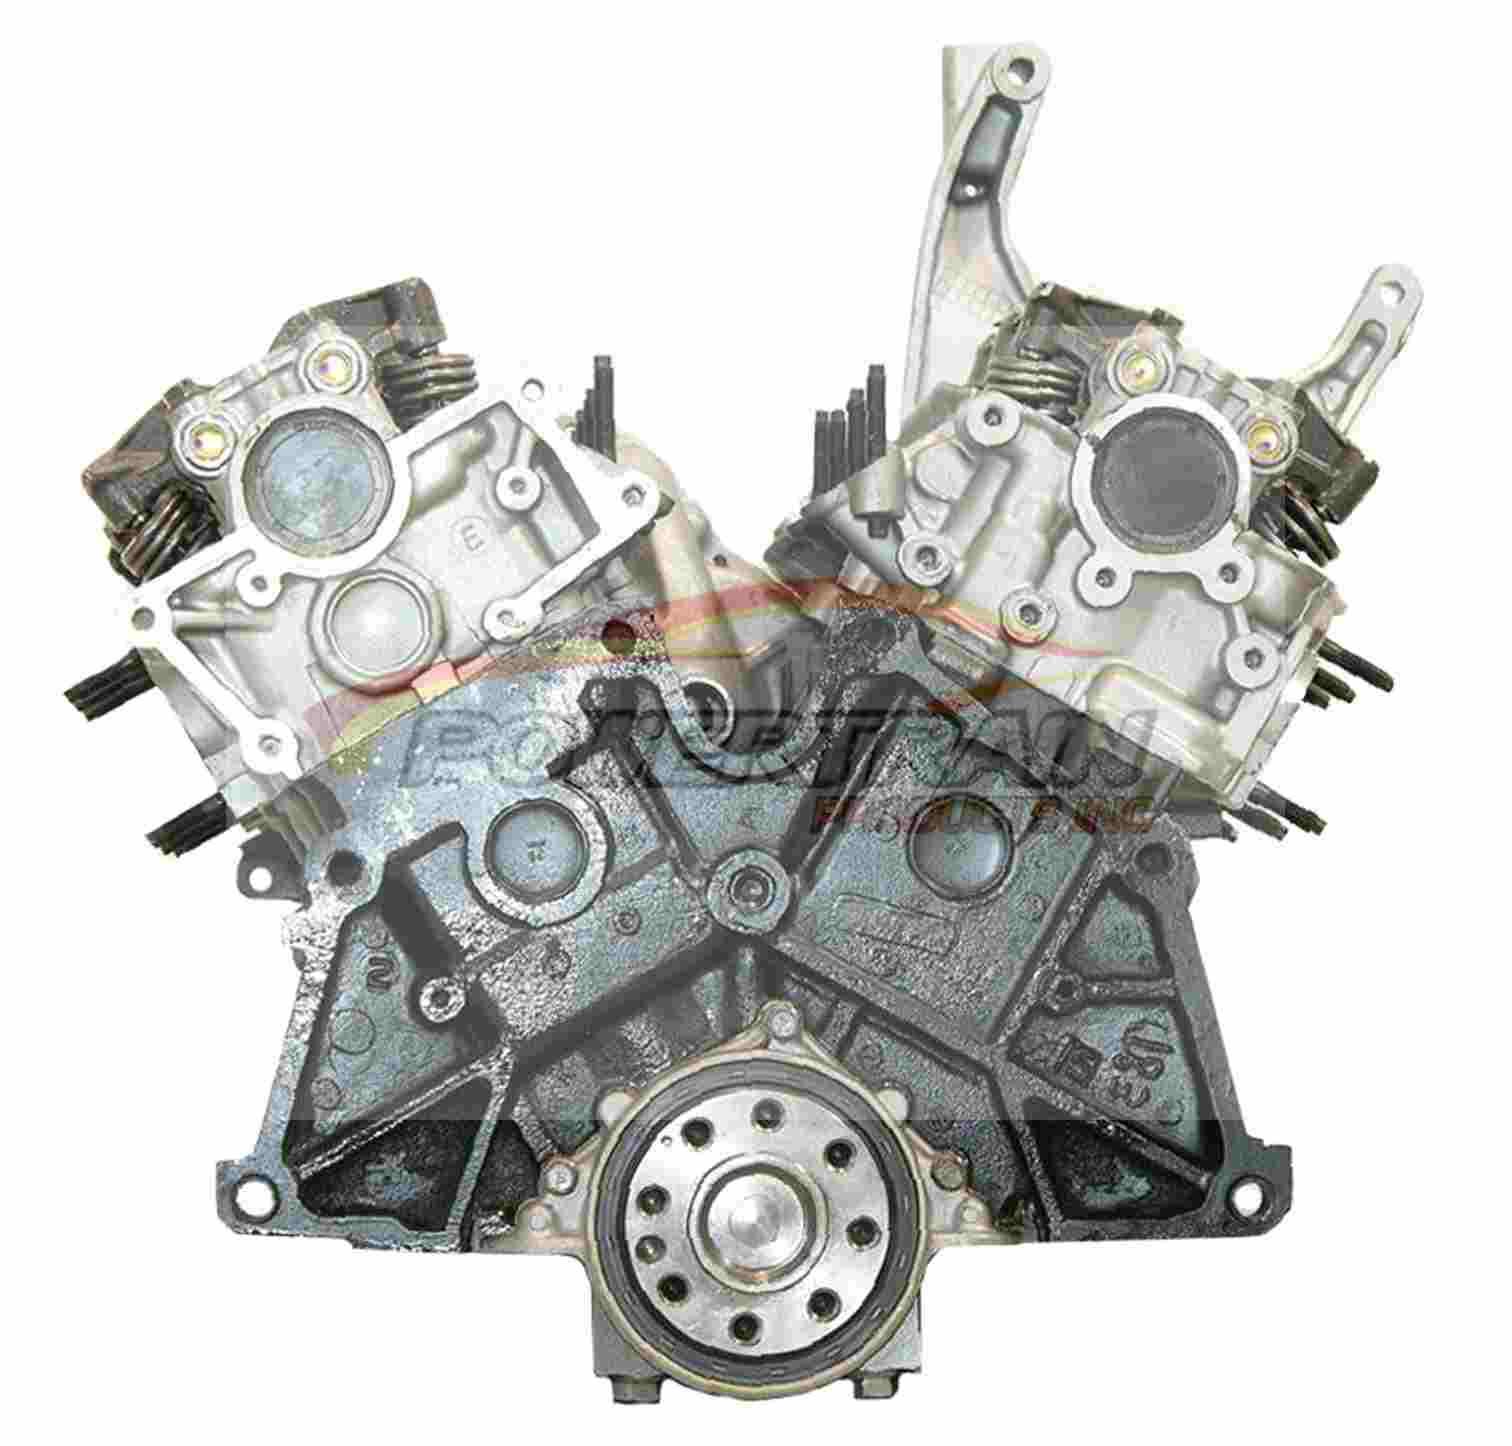 dfj auto uk delivery mitsubishi online buy motor starter fast